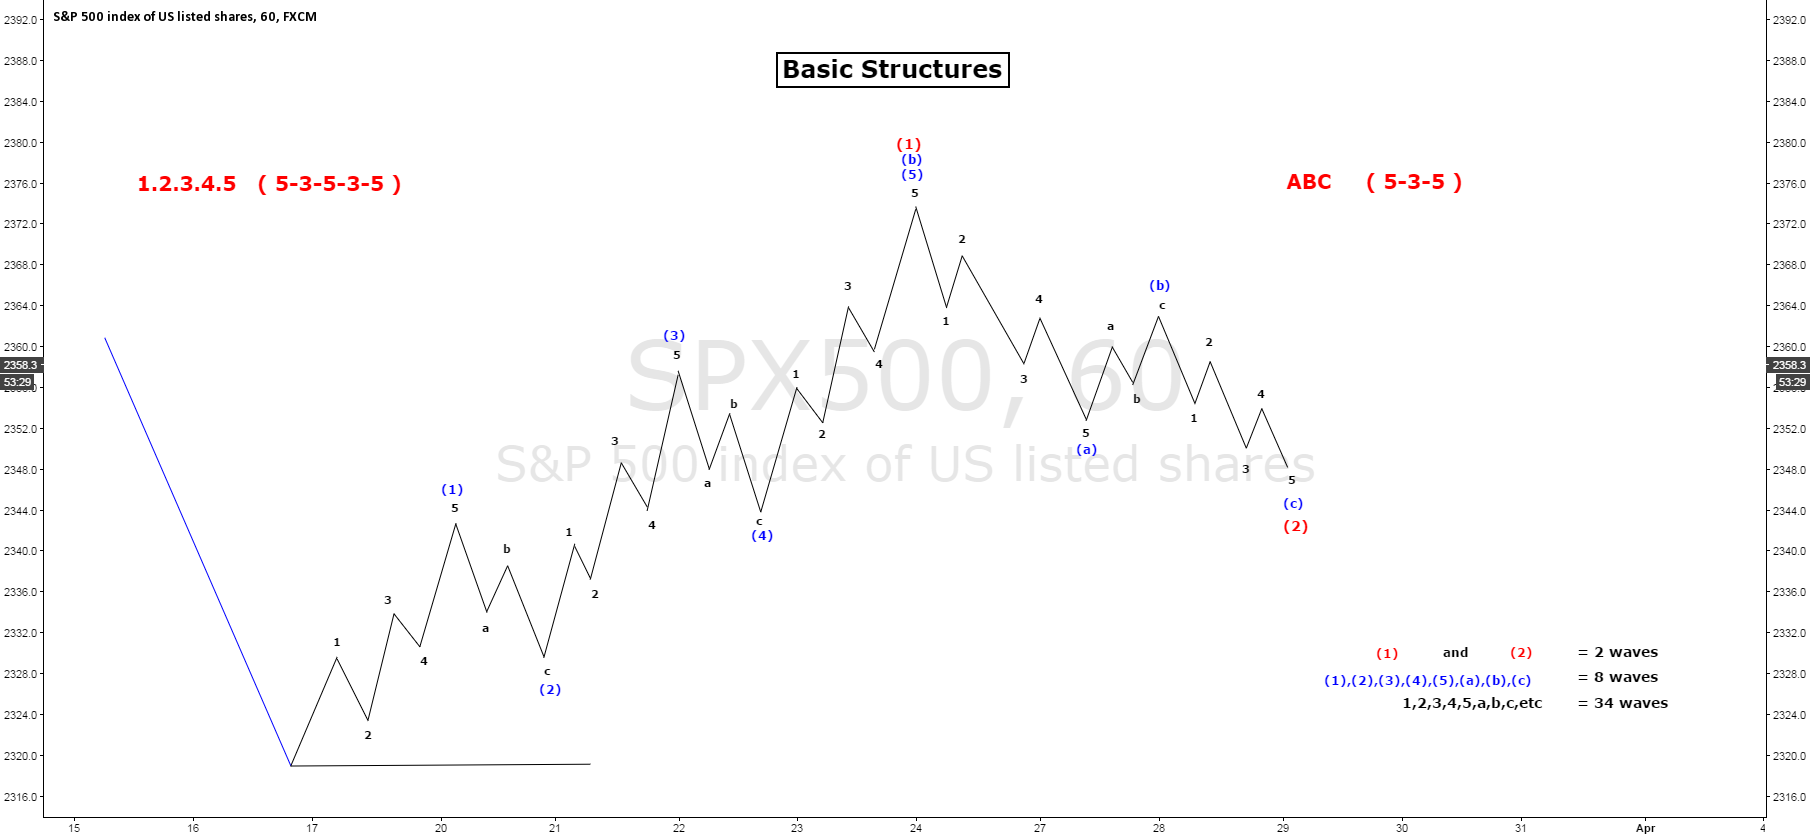 Basic Structures Elliot wave 1.2.3.4.5 A.B.C